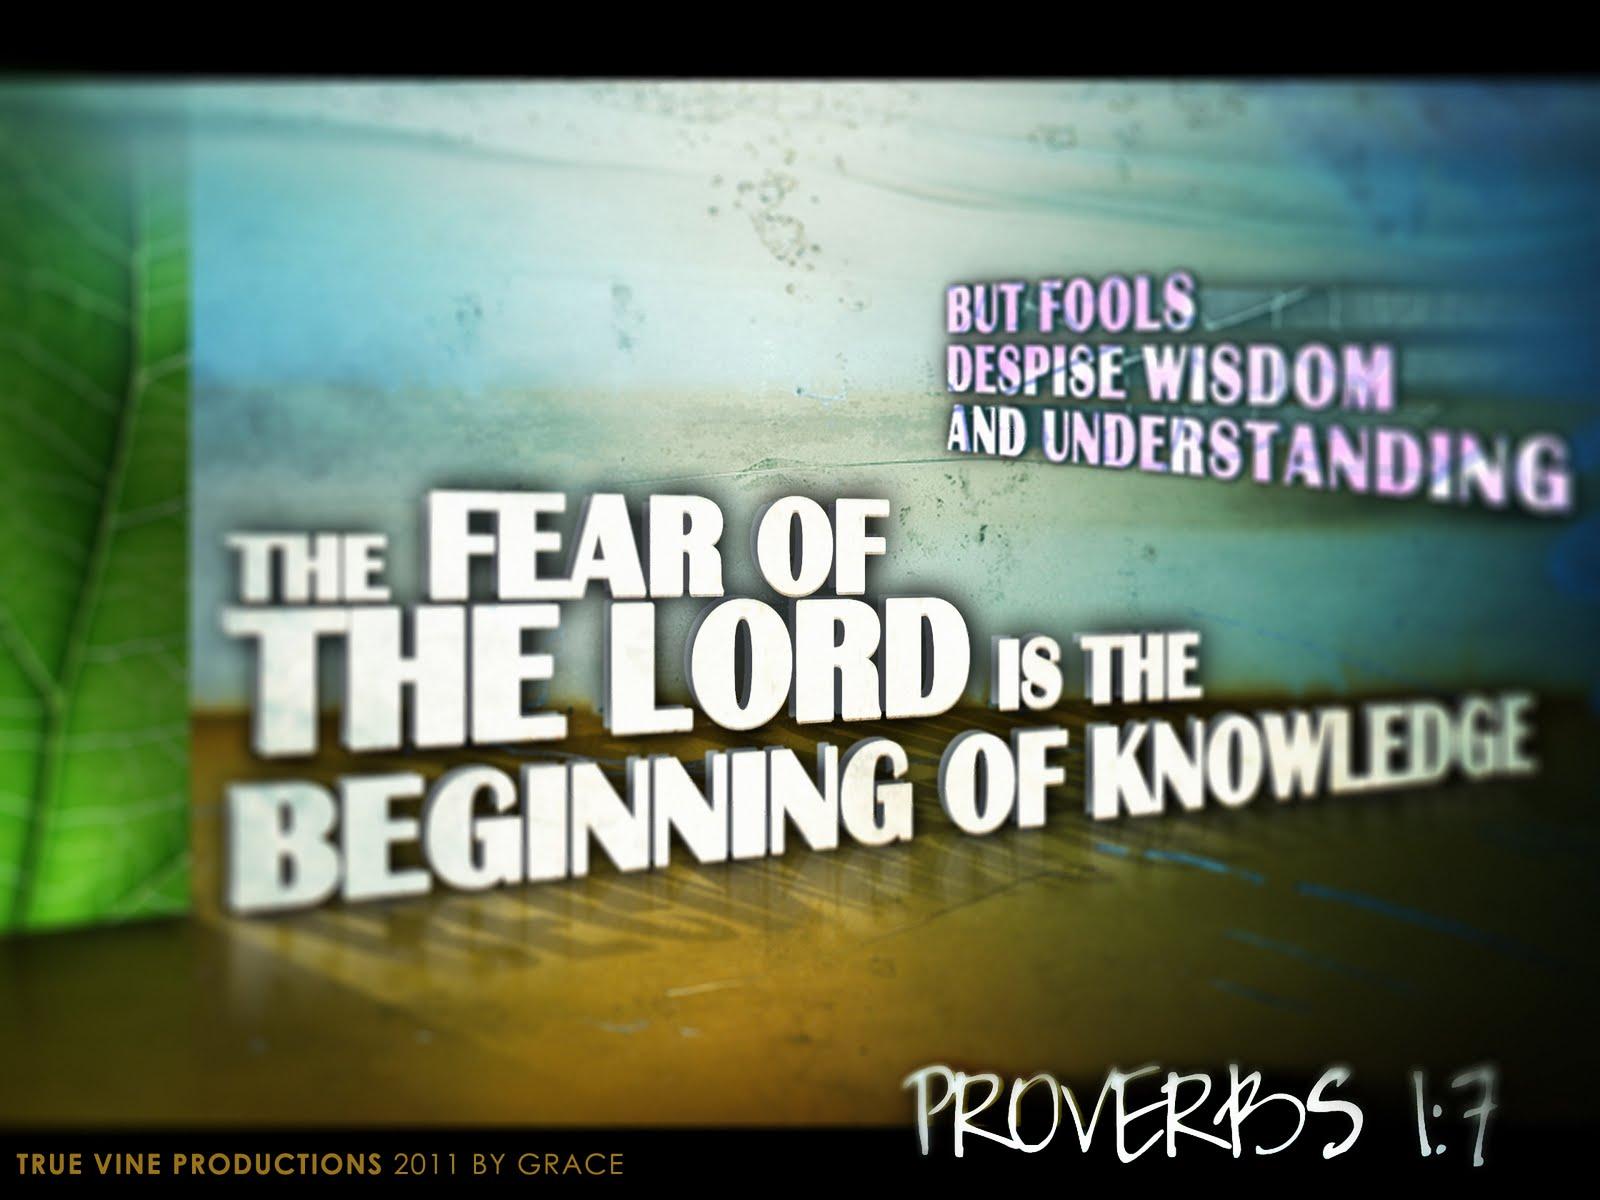 Proverbs 1 7 Wallpaper HD